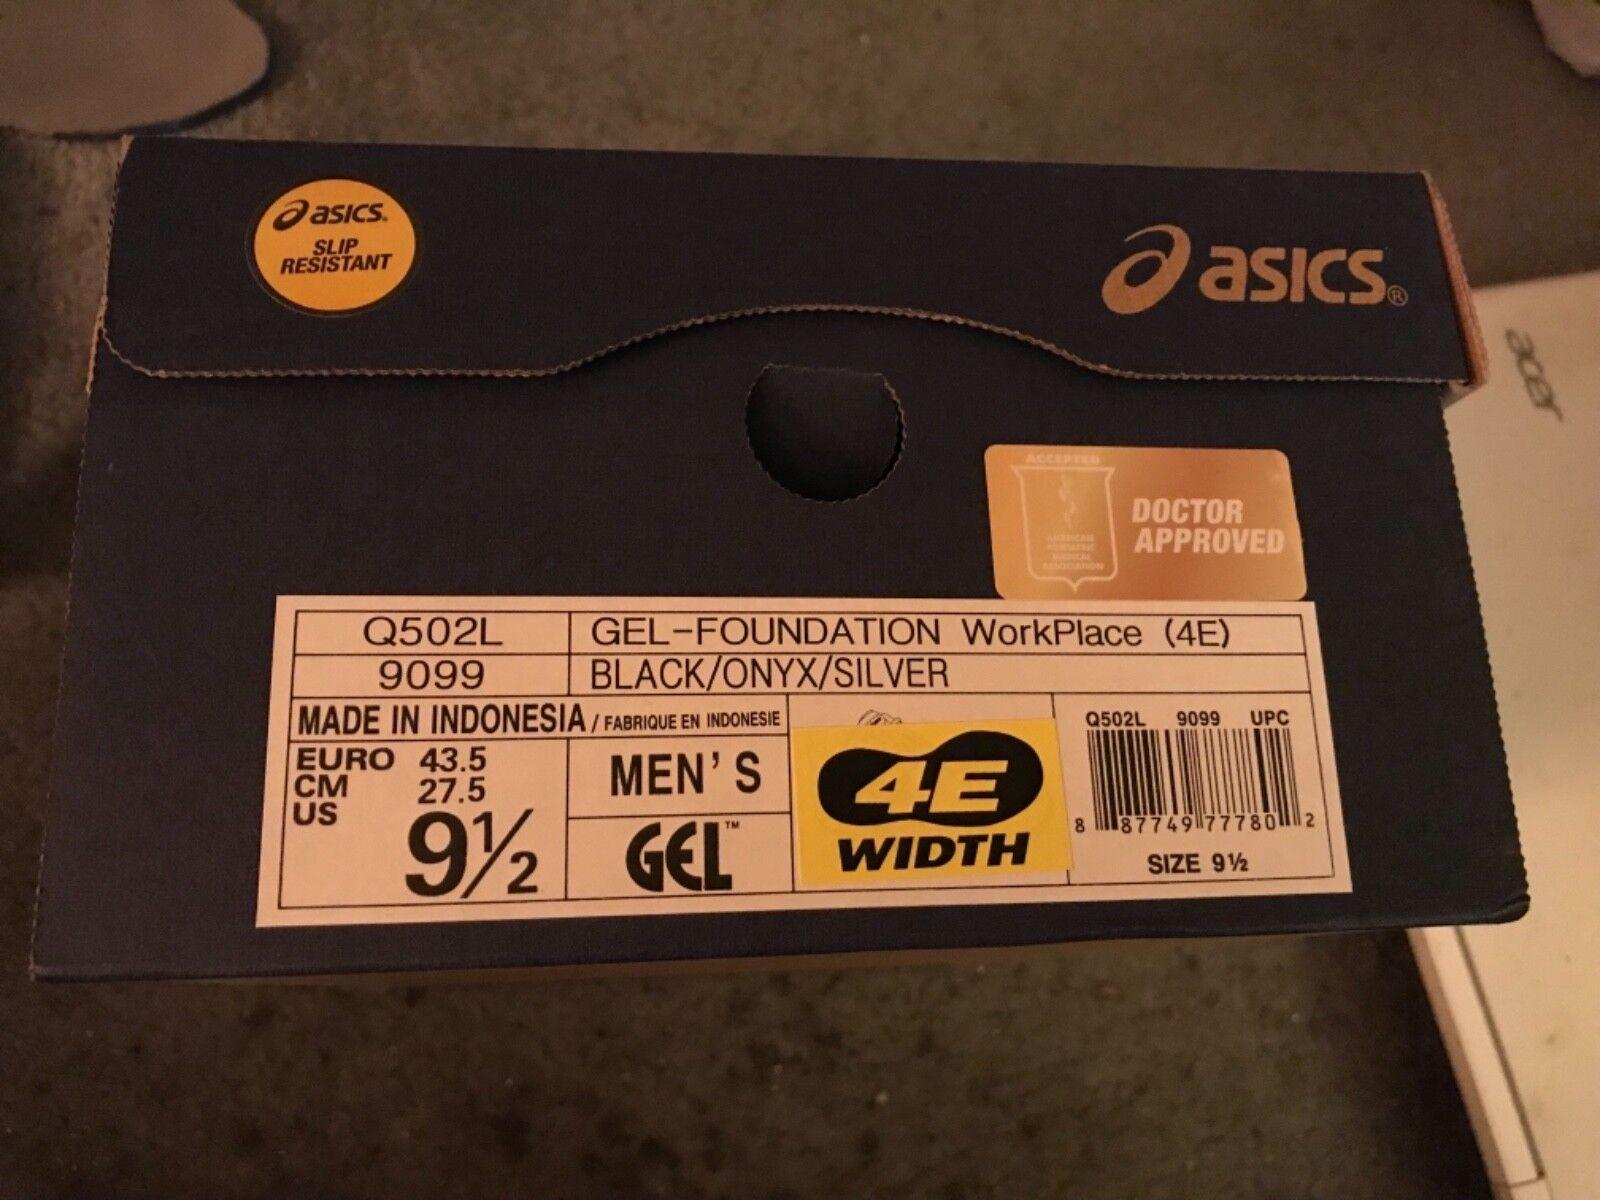 ASICS Mens Gel-Foundation Workplace (4E) (4E) (4E) Walking shoes, Black Onyx Silver, 9.5 4E 5e1e98